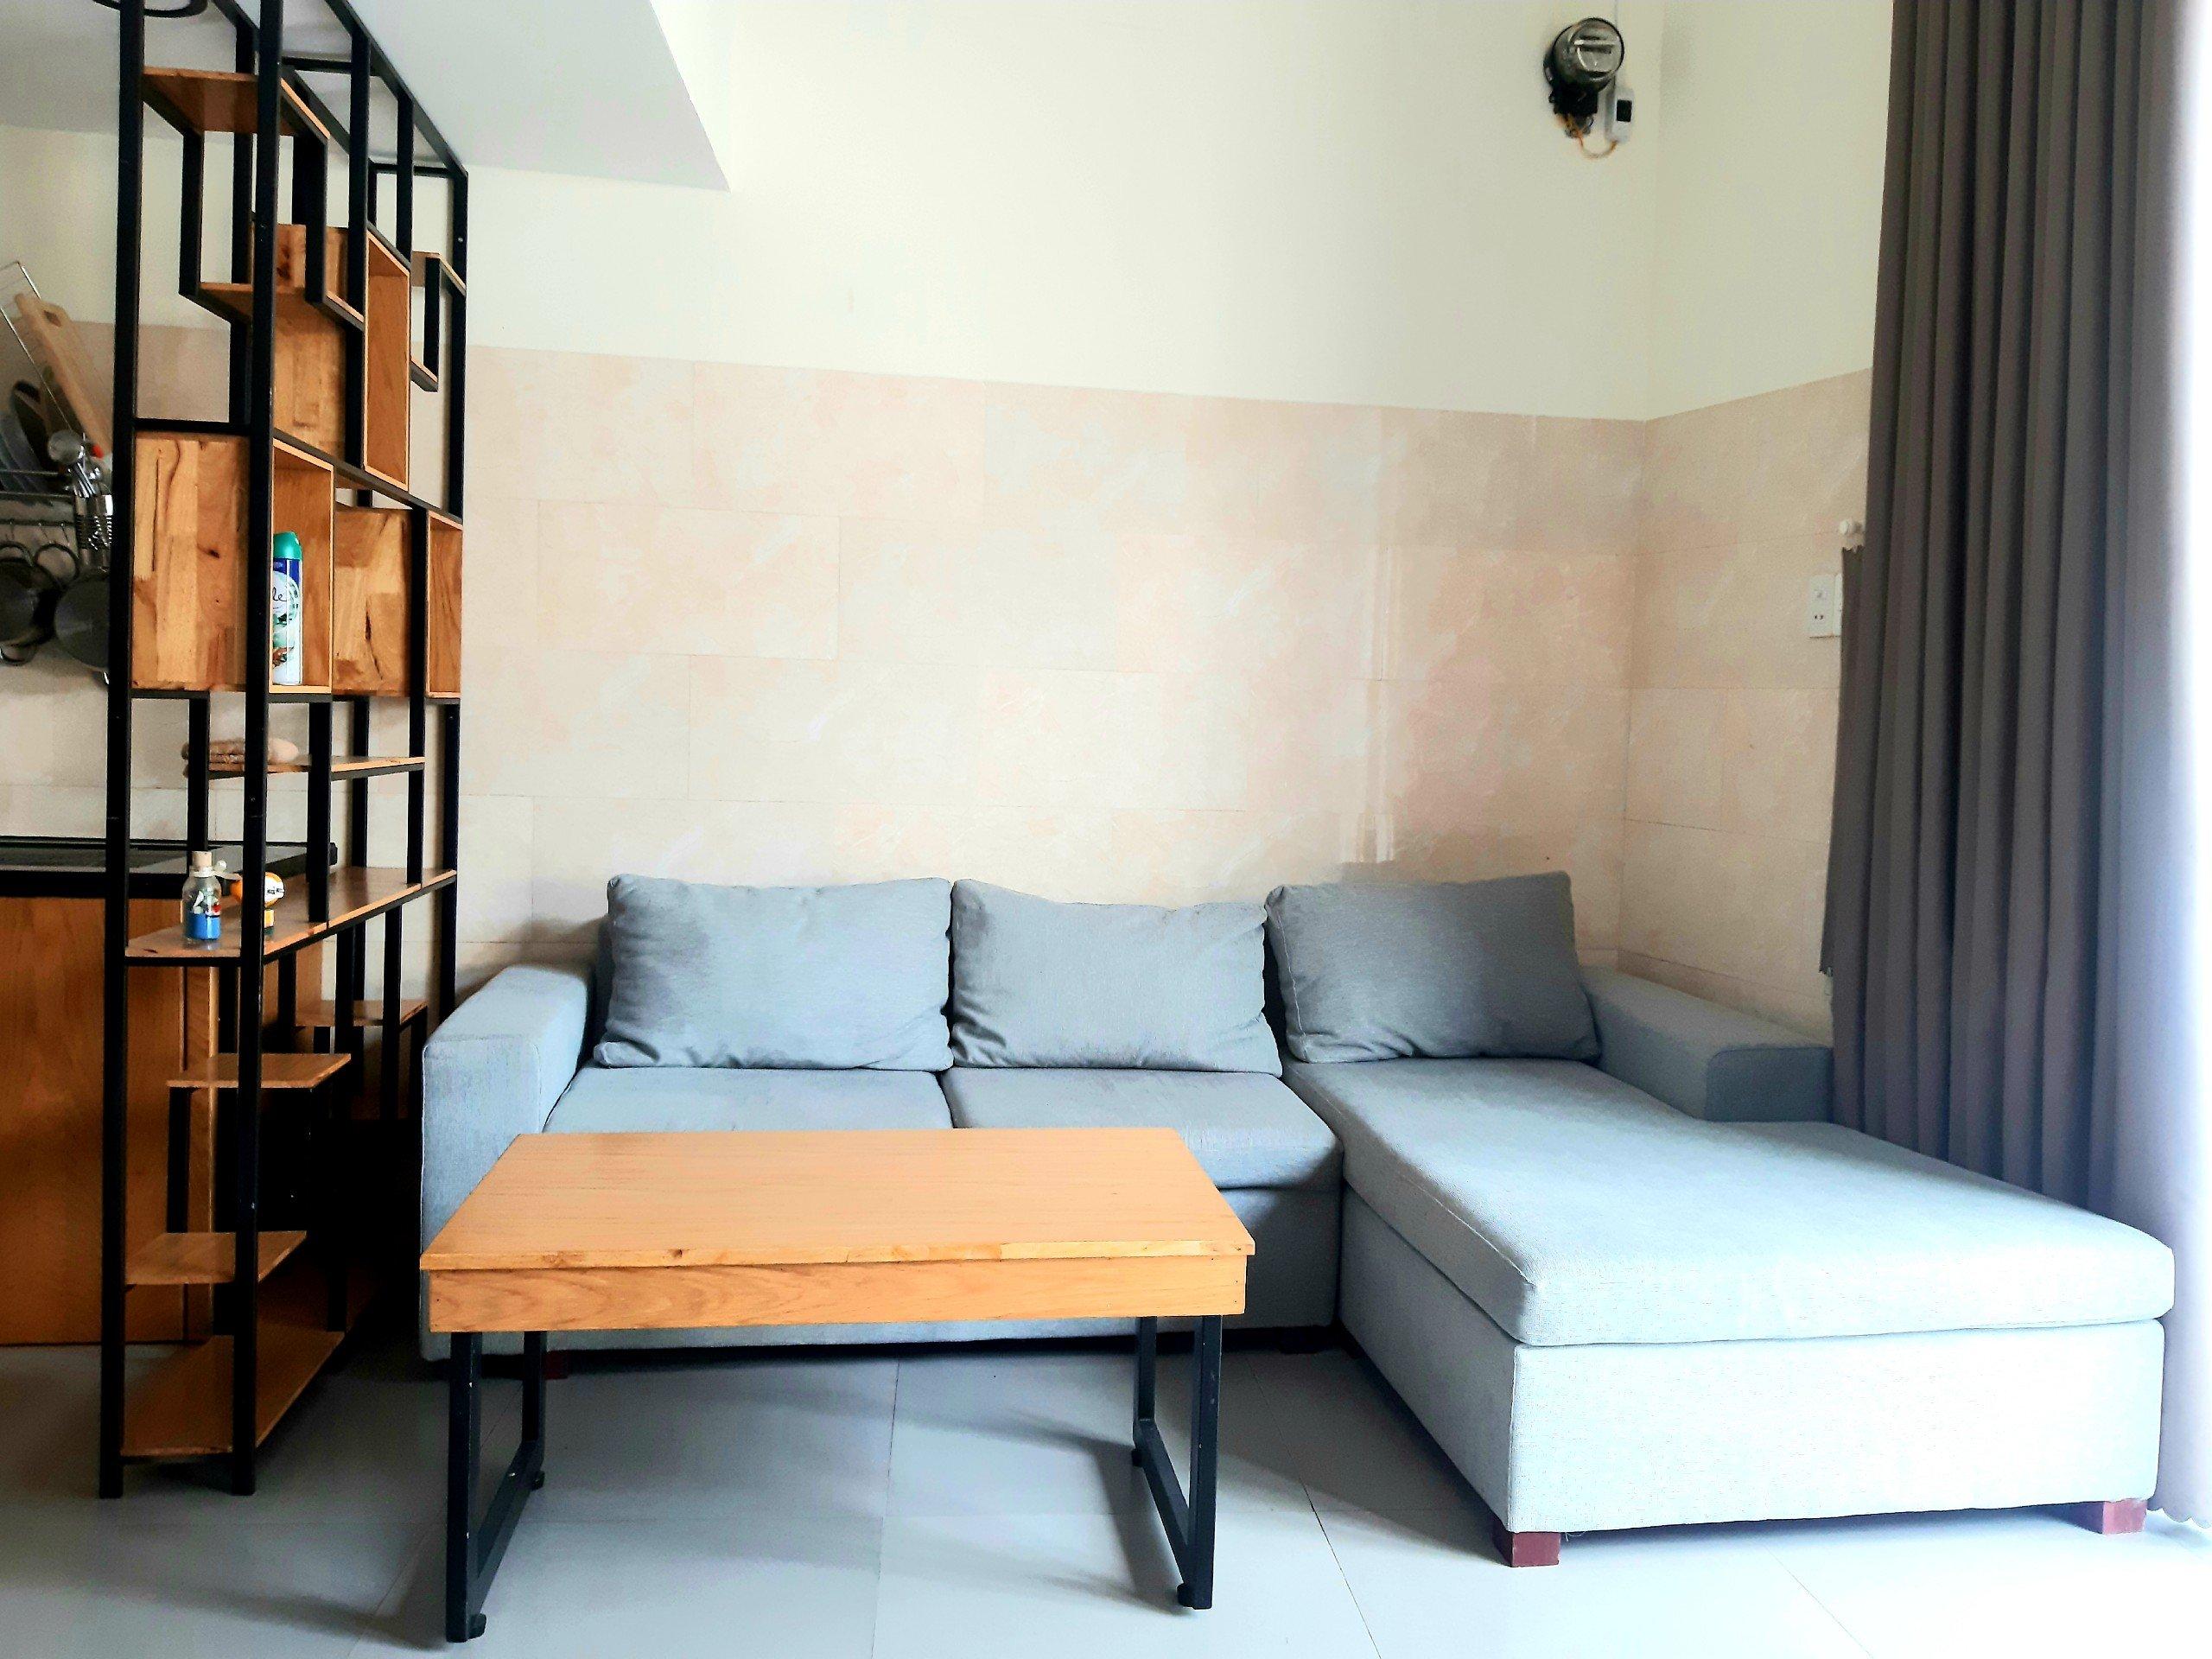 2 bedrooms apartment for rent close to Pham Van Dong beach Da Nang